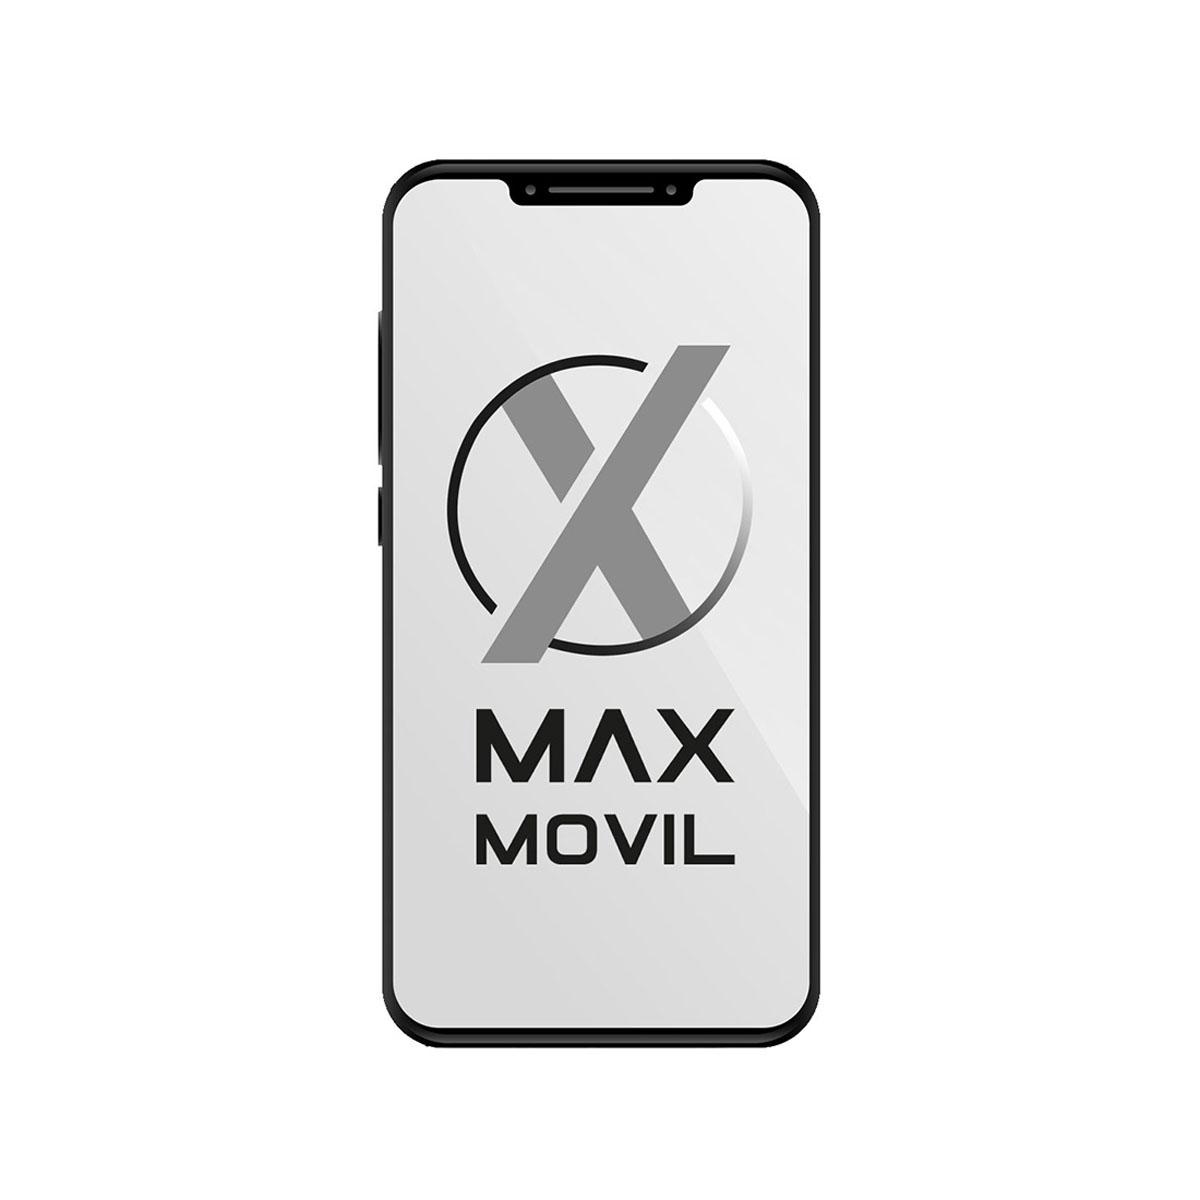 Auriculares estéreo Sony MDR-ZX310 blanco